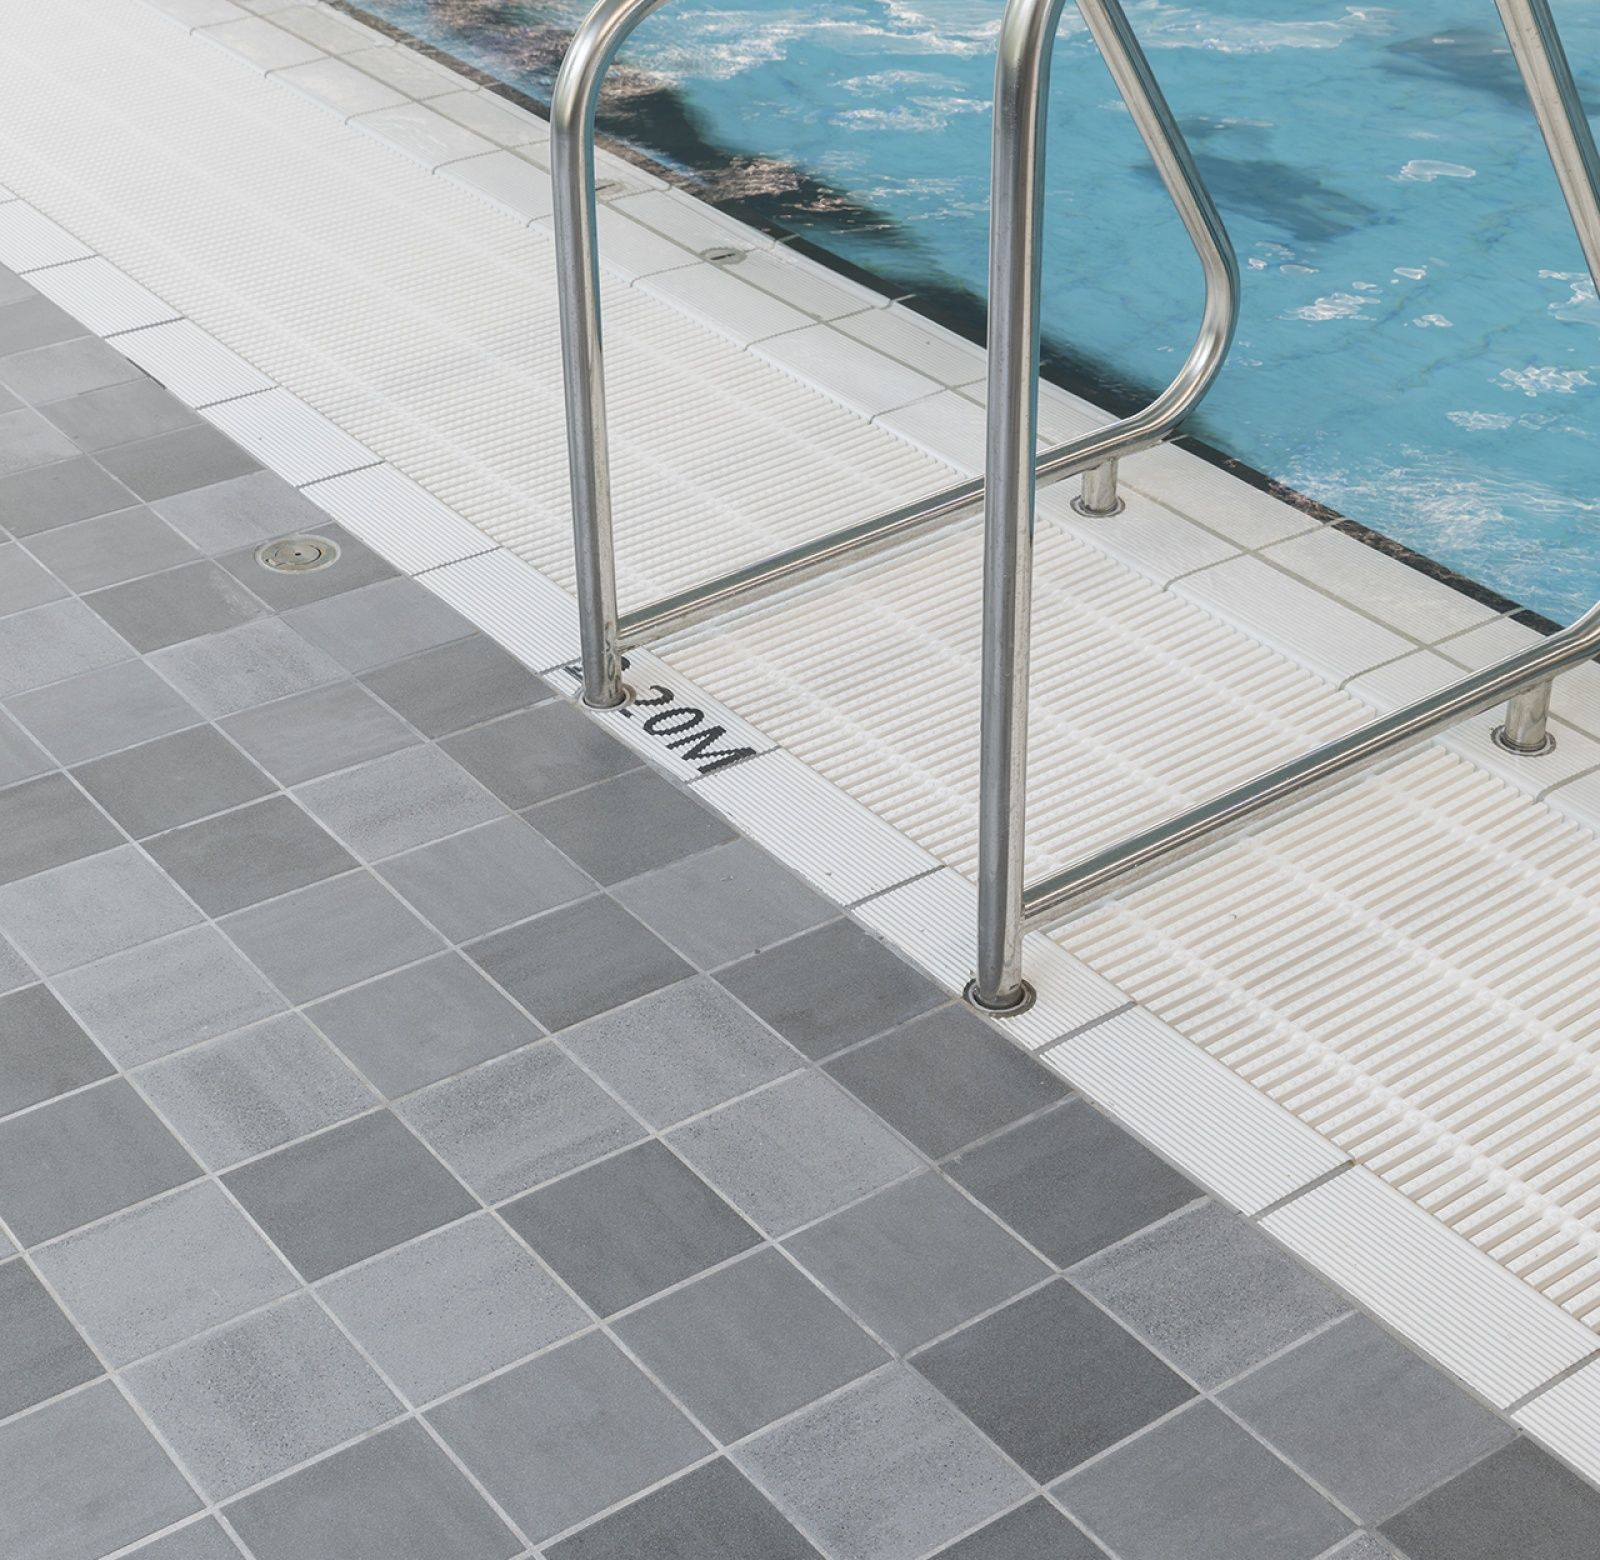 Mosa Com Rf0781 Sportcomplex Amarena Nl Mosa Mosatiles Tiles Ceramics Interior Inspiration Design Swimmingpool Shower Dutch Design Flooring Tiles